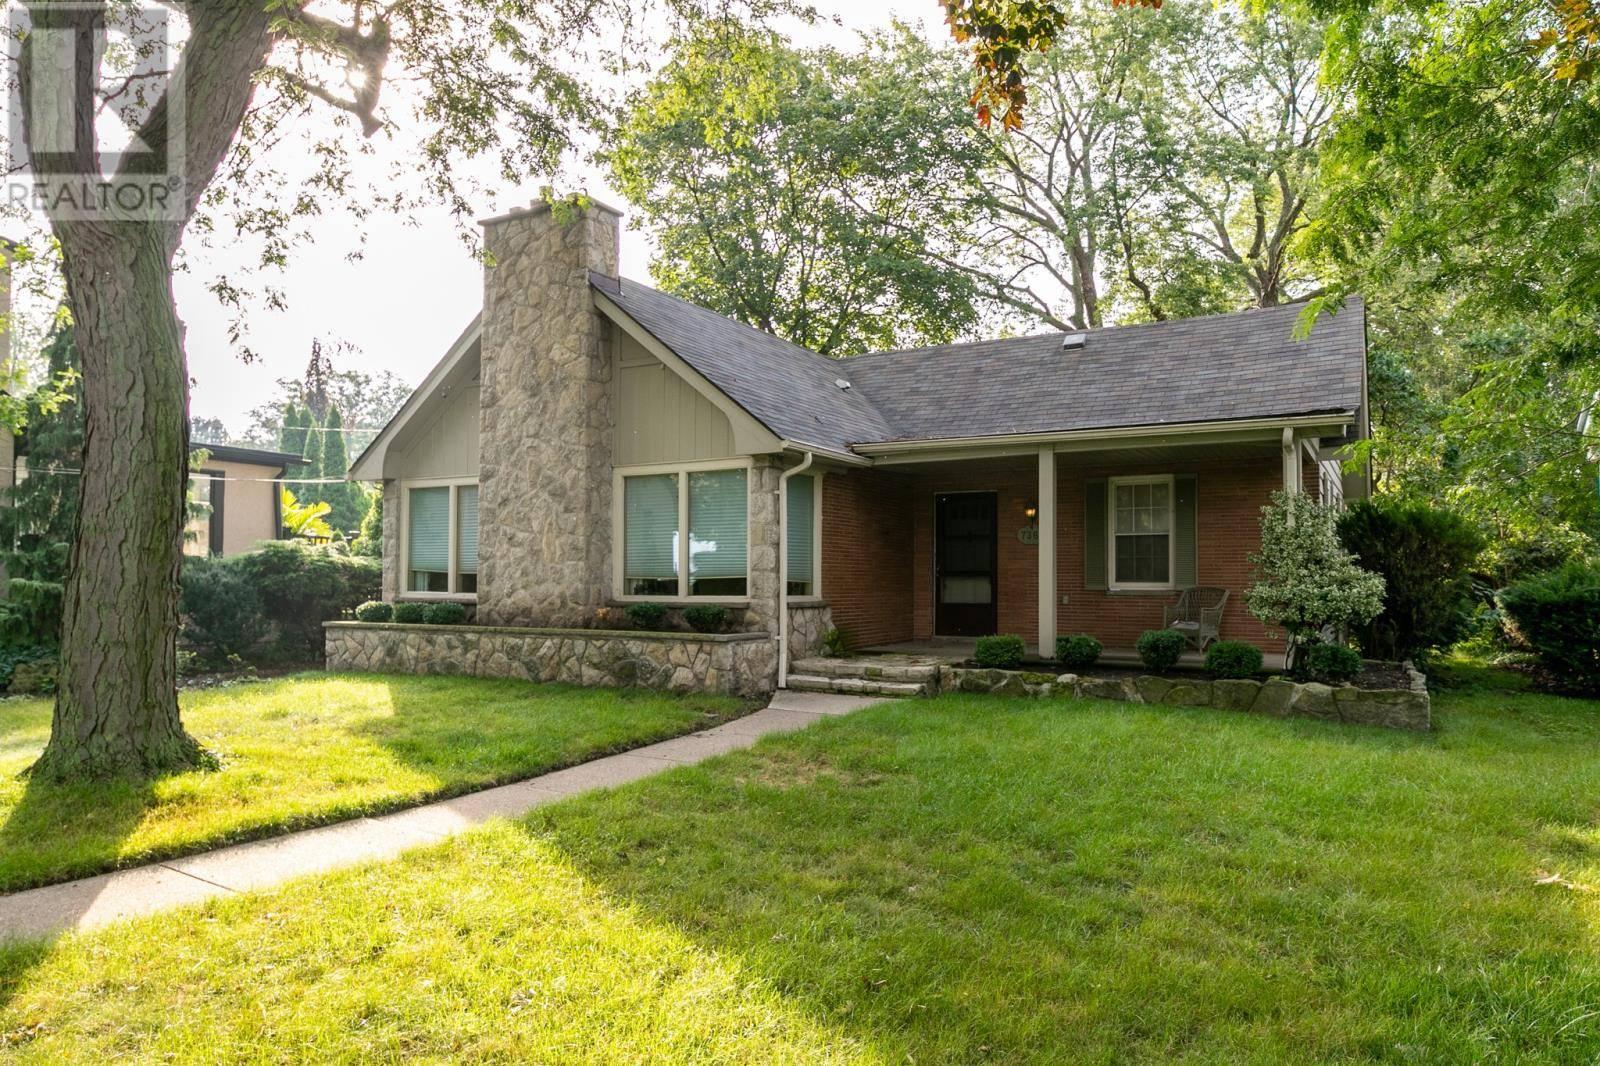 House for sale at 7363 Riverside Dr East Windsor Ontario - MLS: 19024748